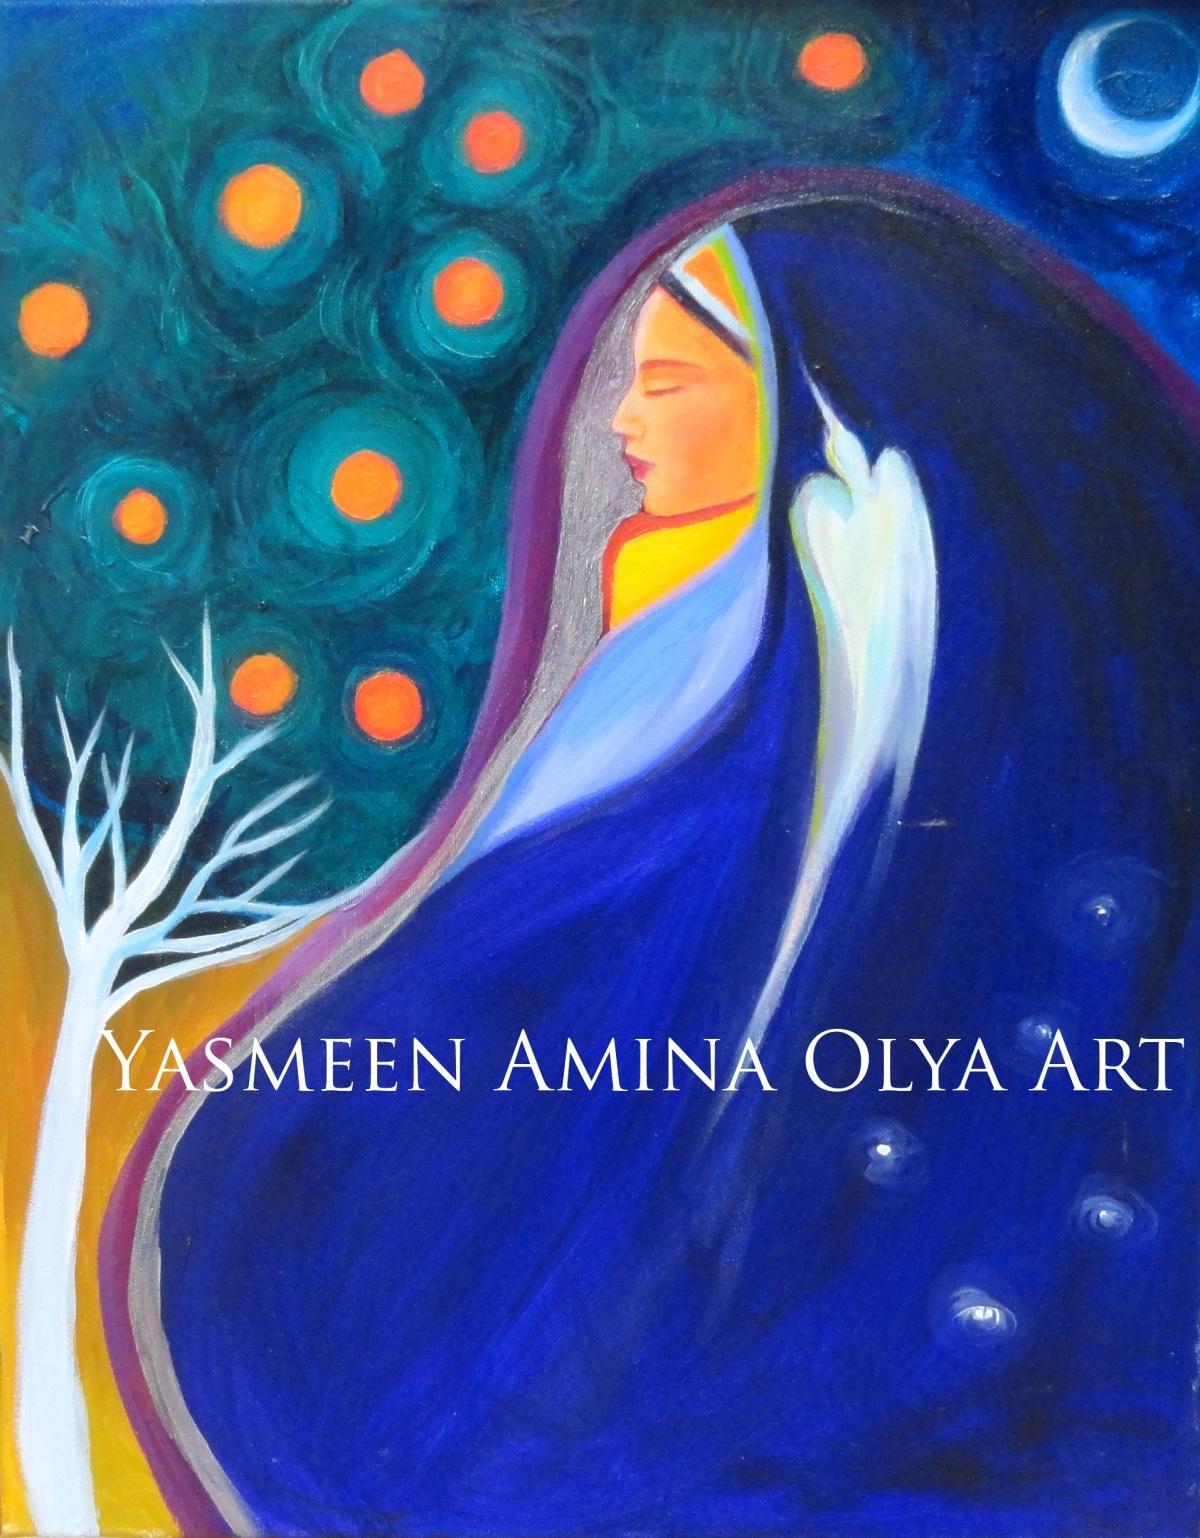 Islamic painting, Islamic Art, Sufi Artwork, Sufism, Yasmeensong